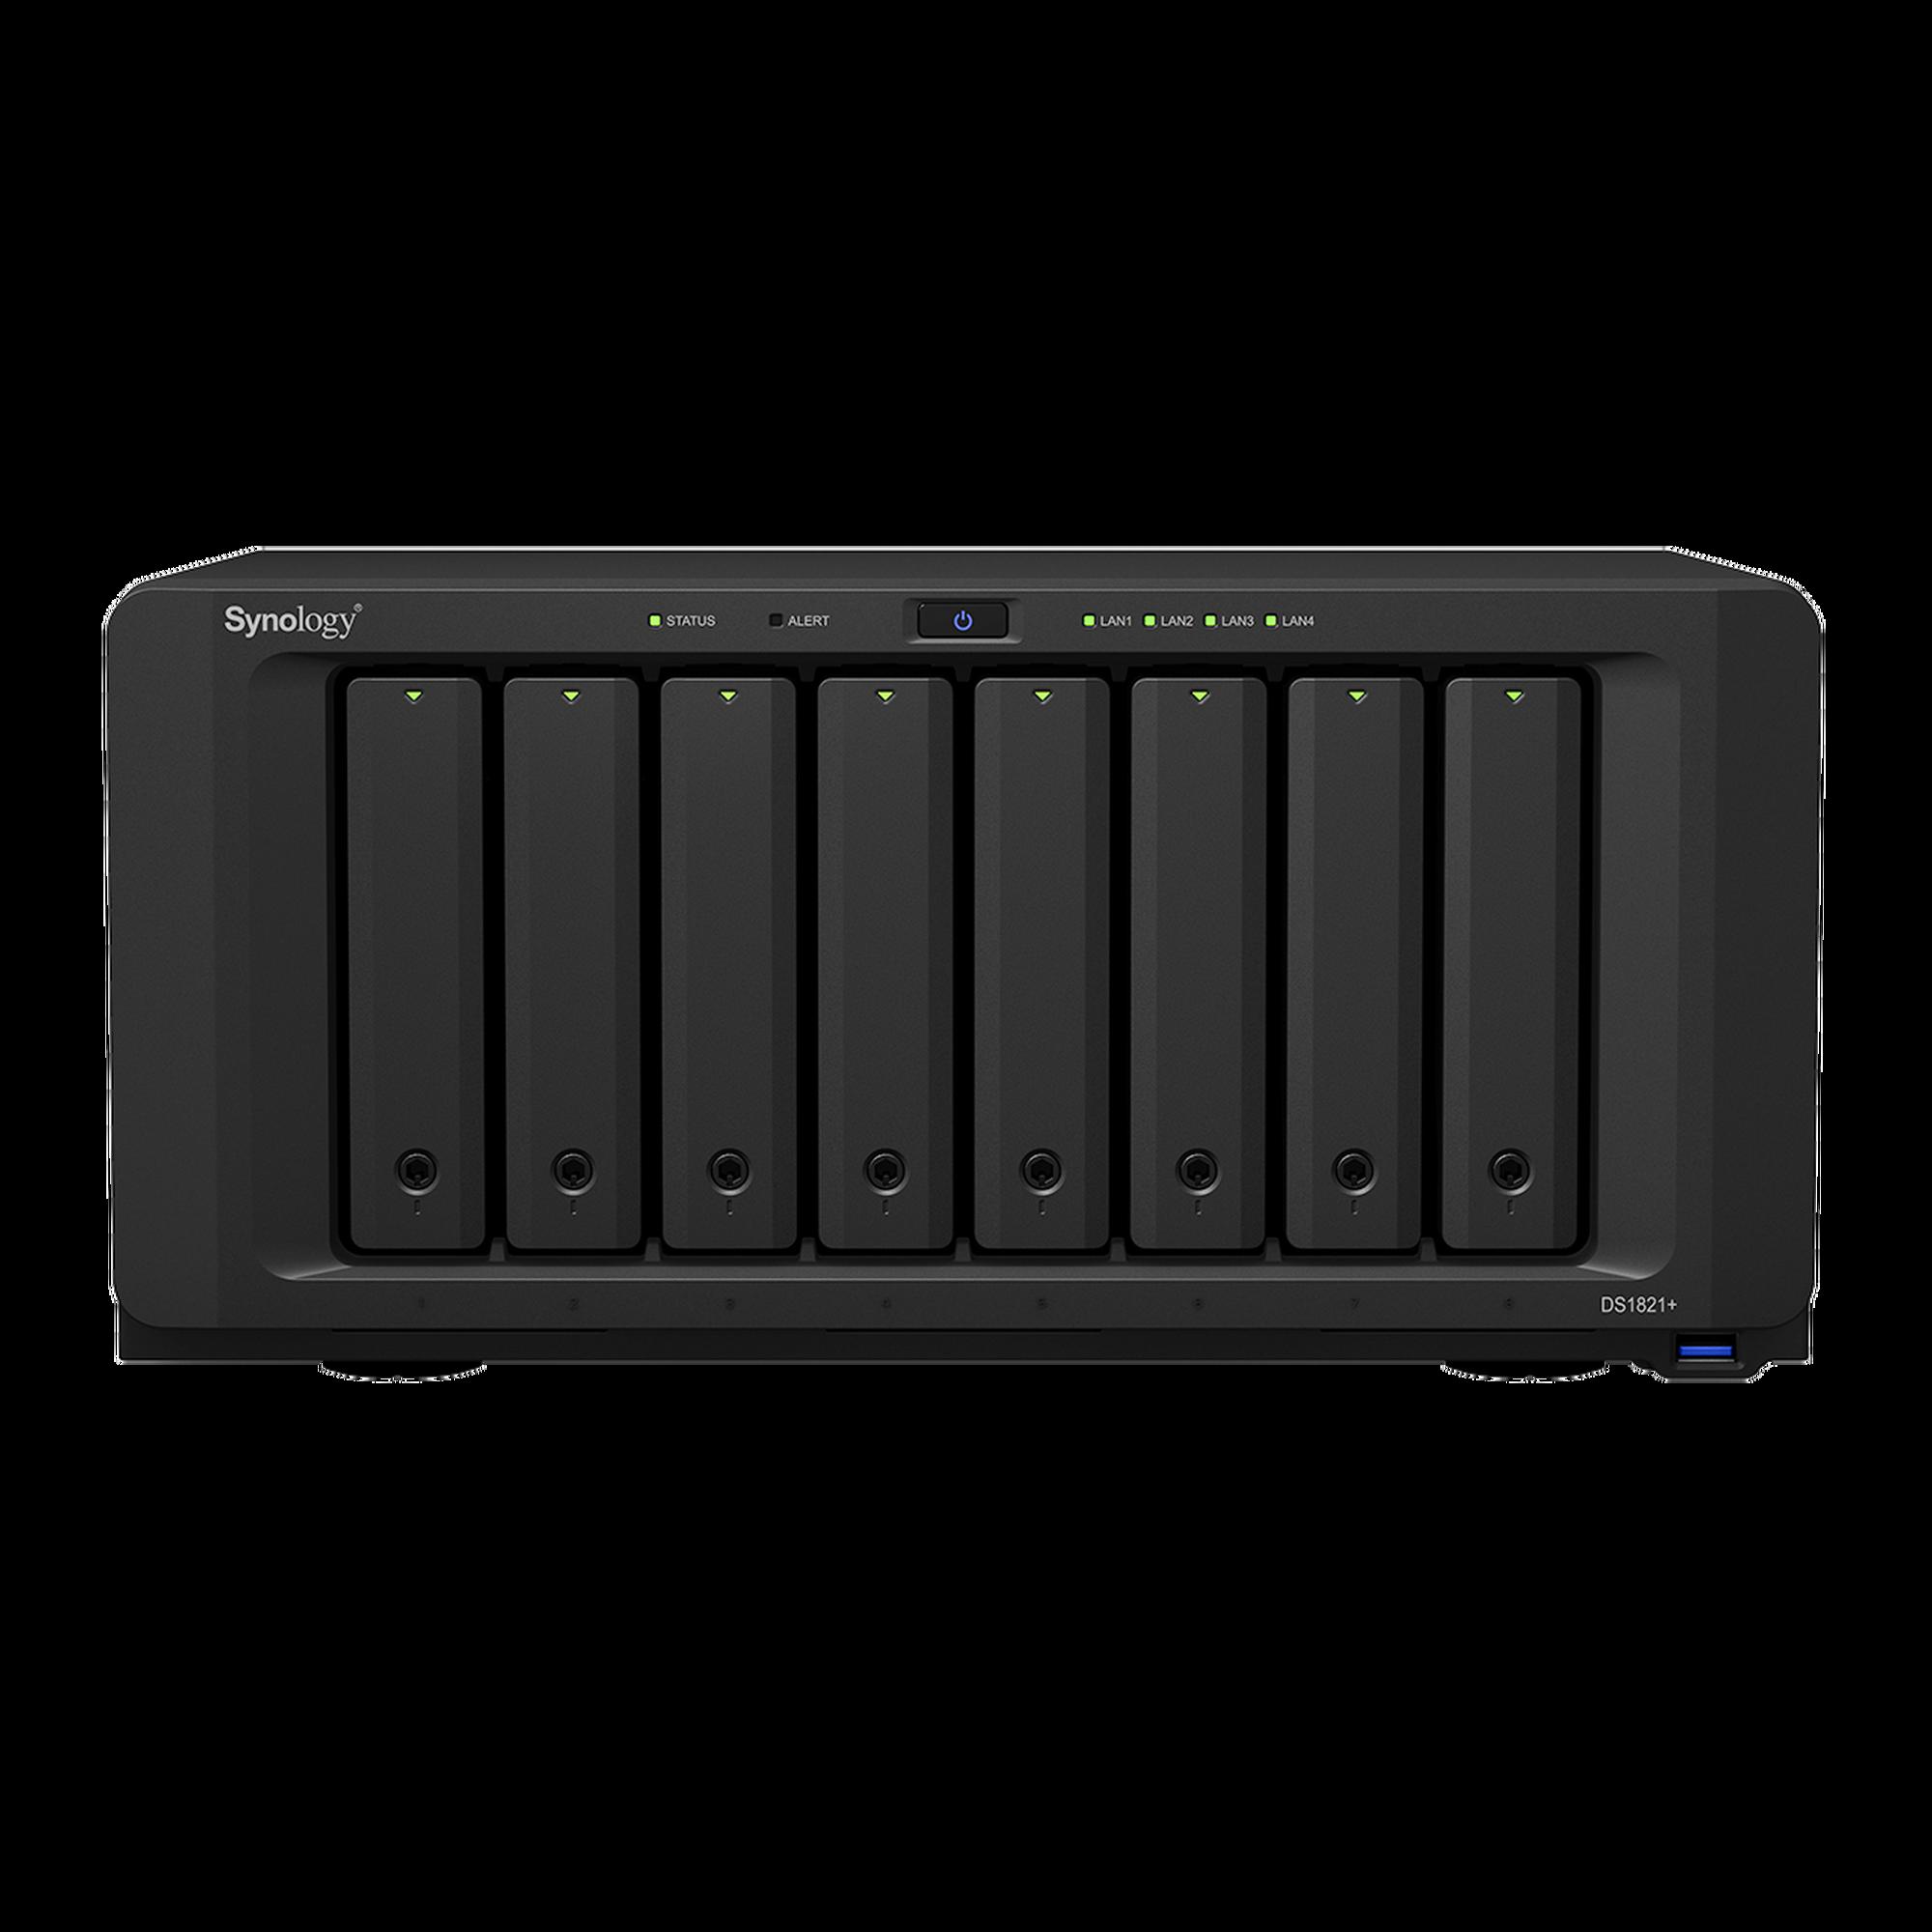 Servidor NAS de escritorio con 8 bahías / Expansible a 18 bahías / Hasta 256 TB / 4GB de RAM